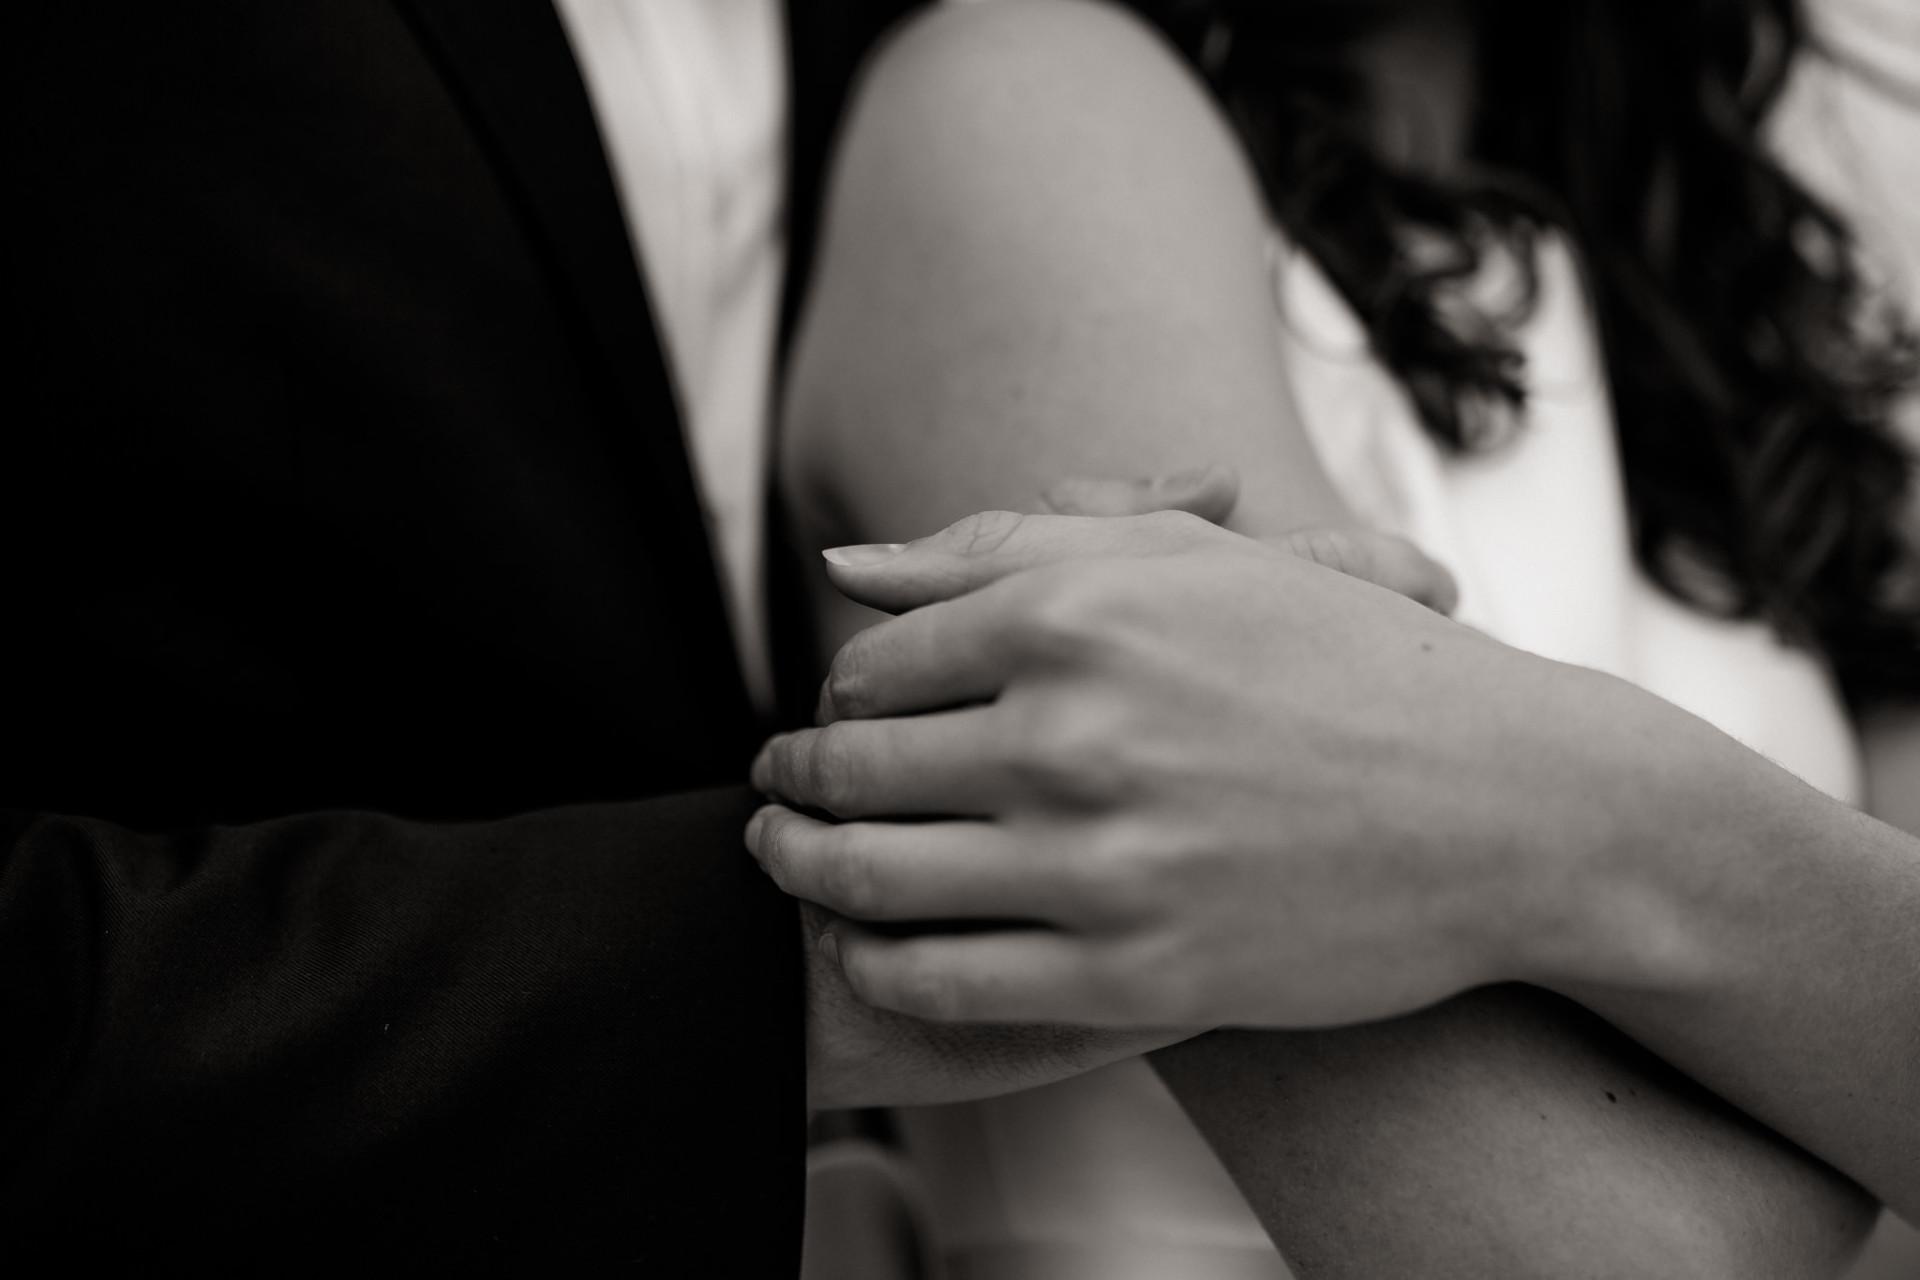 black and white wedding-wedding photo detail-moody wedding photo